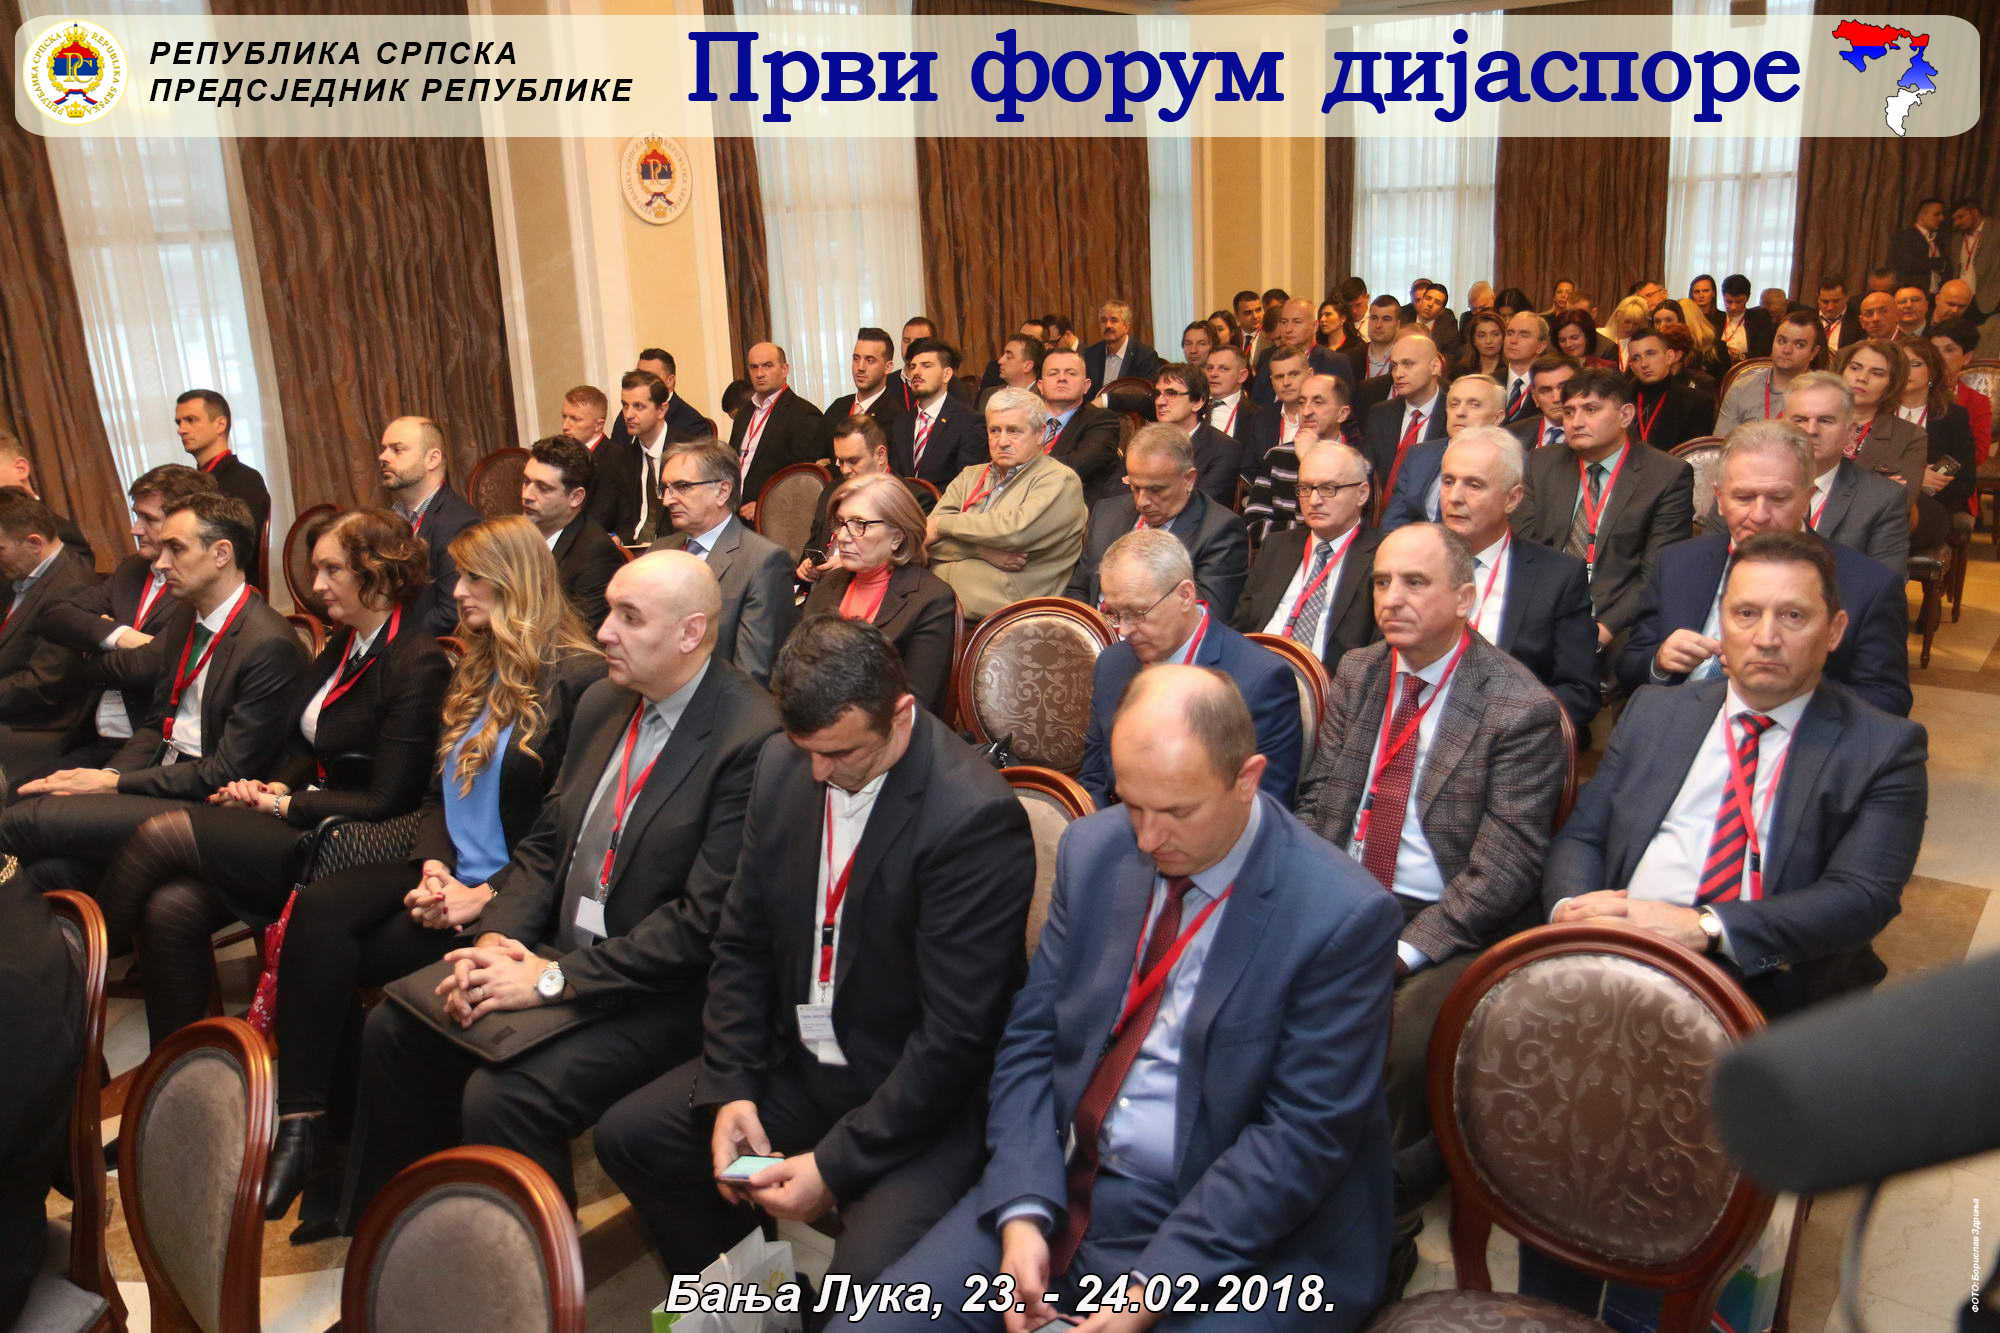 2018-02-23-i-24_prvi-forum-dijaspore_147_zipaphoto_borislav-zdrinja